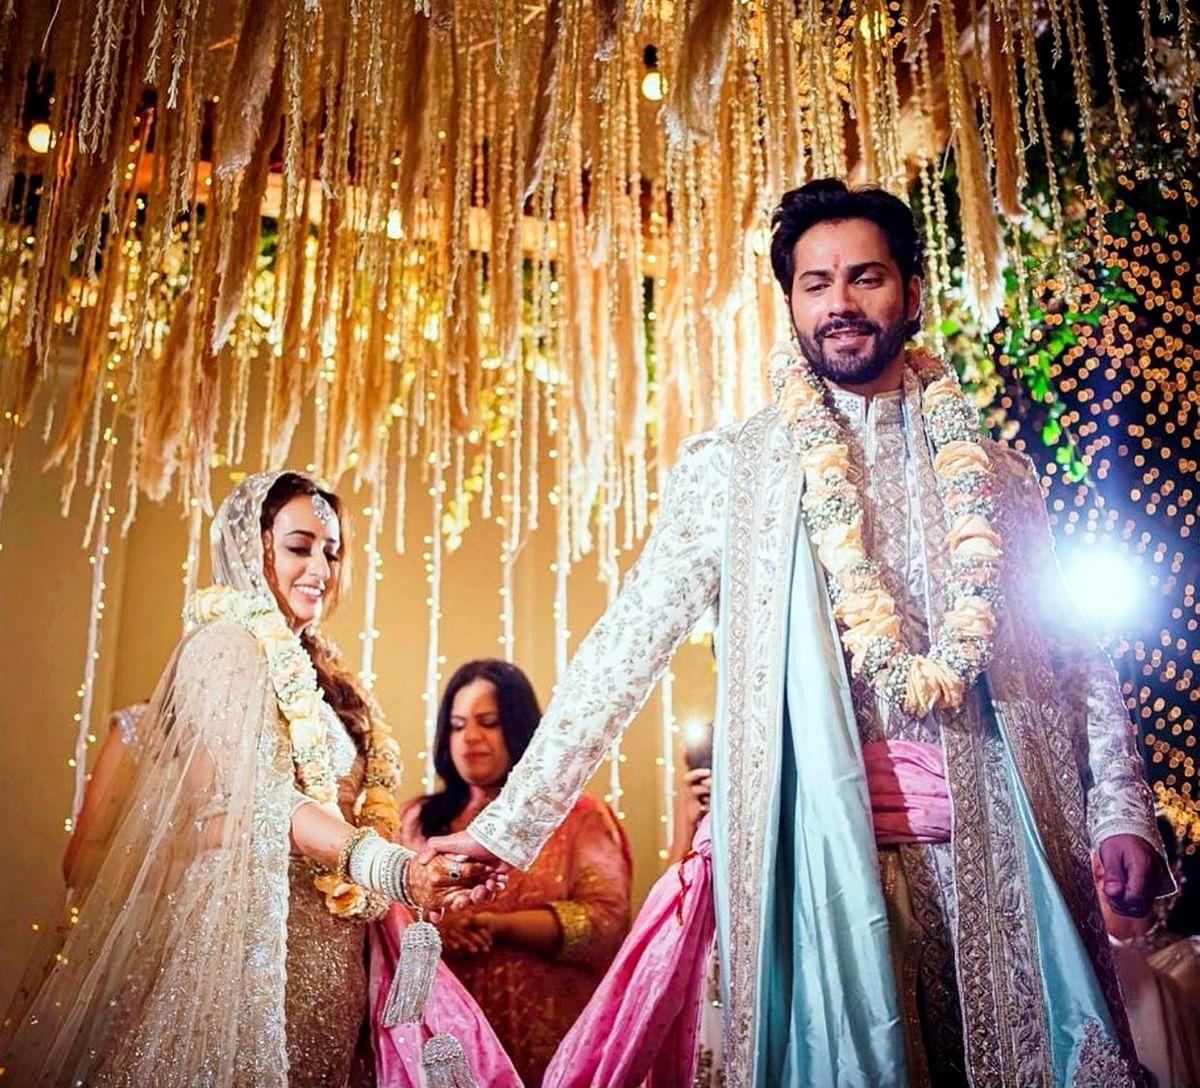 Bollywood actor Varun Dhawan and Natasha Dalal during their wedding ceremony at Alibaug in Mumbai, Sunday, 24 January 2021.